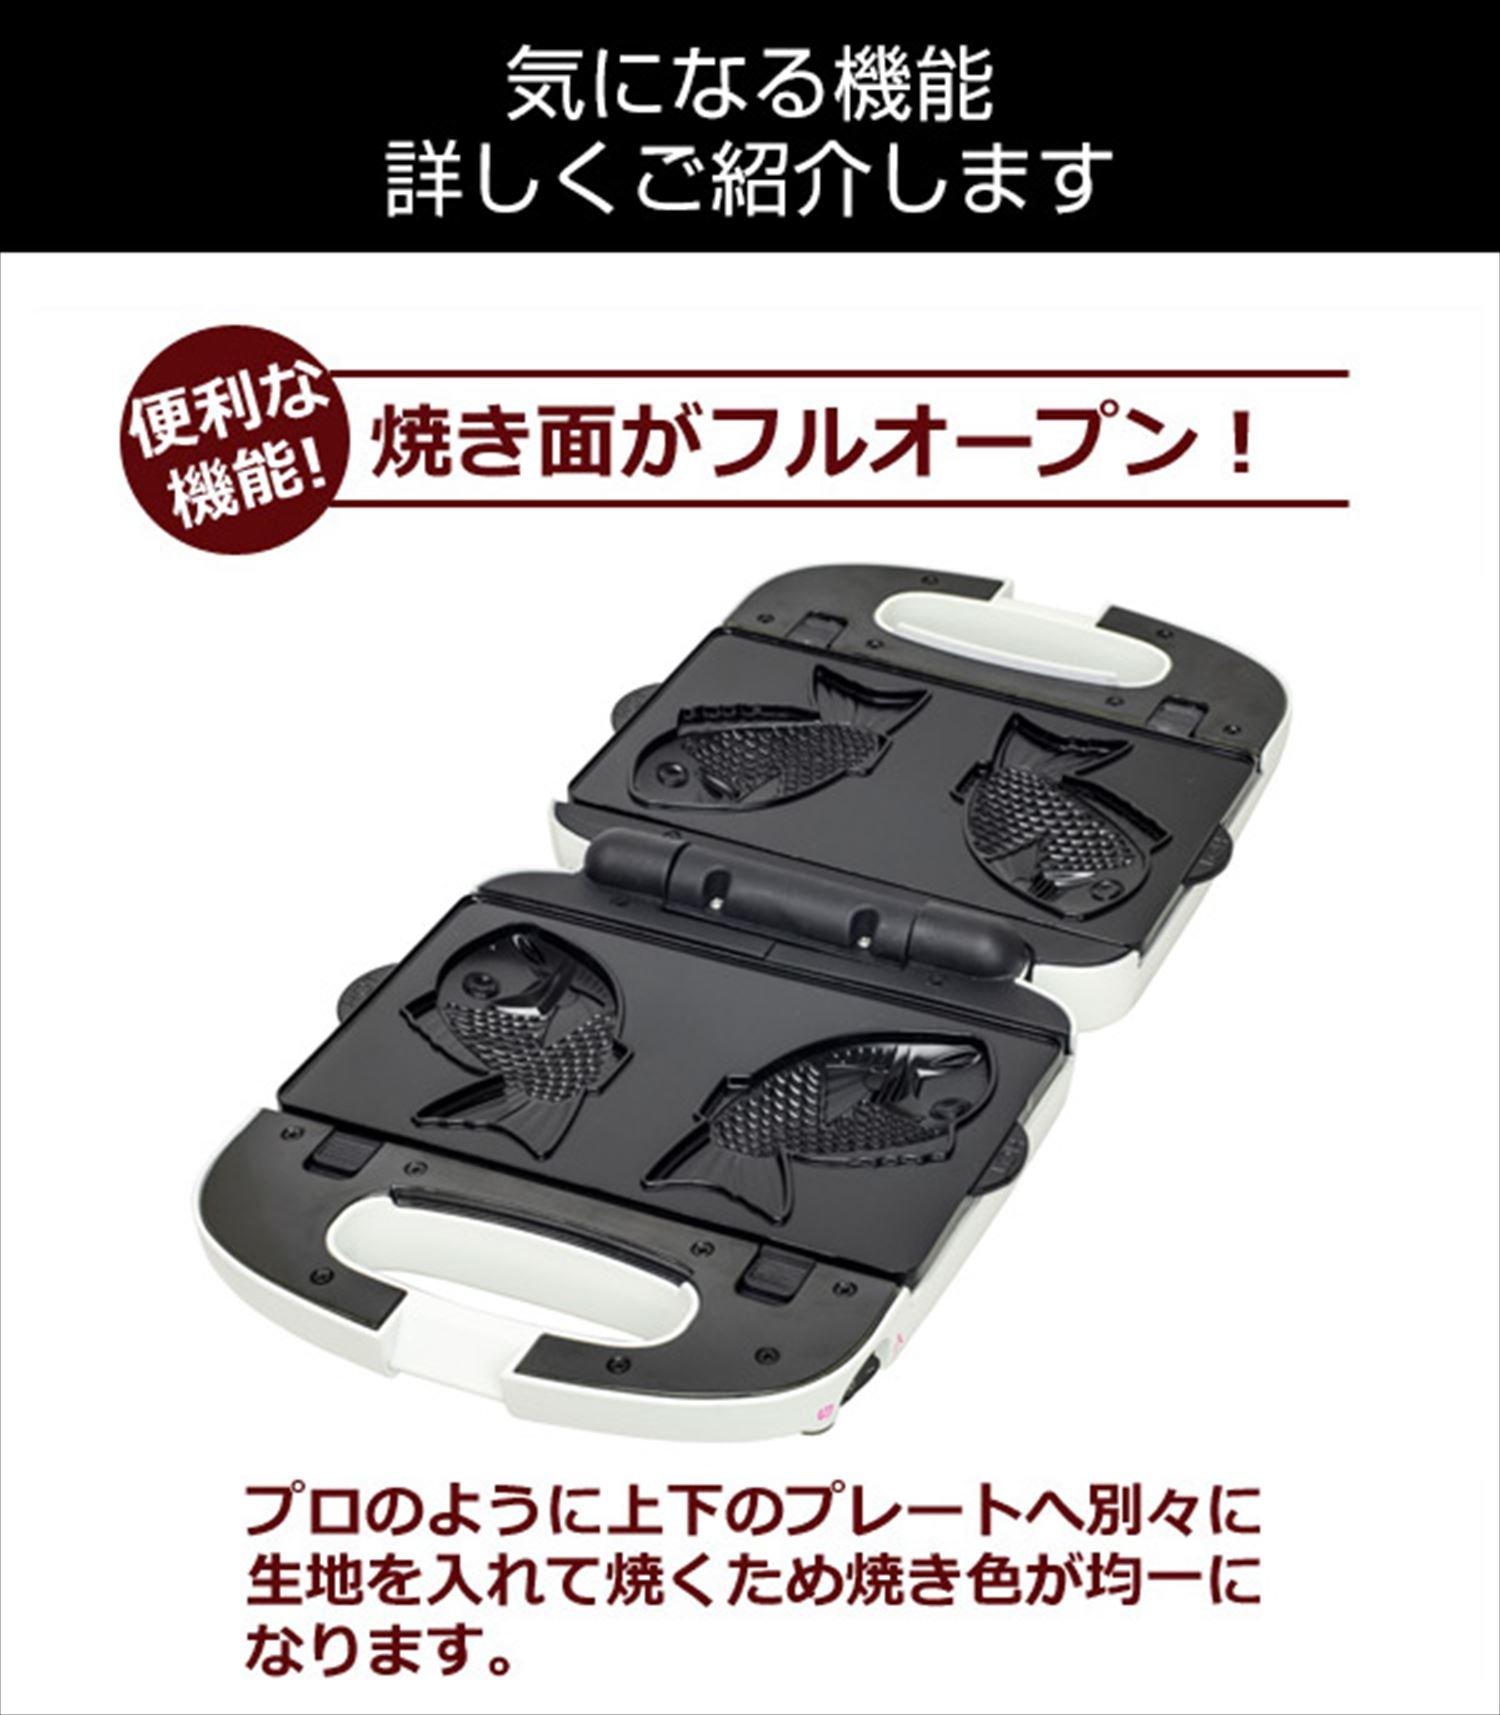 Yamazen (YAMAZEN) multi Sand maker (with hot sand Taiyaki plate) White YHS-X700-2N (W) by Yamazen (YAMAZEN) (Image #12)